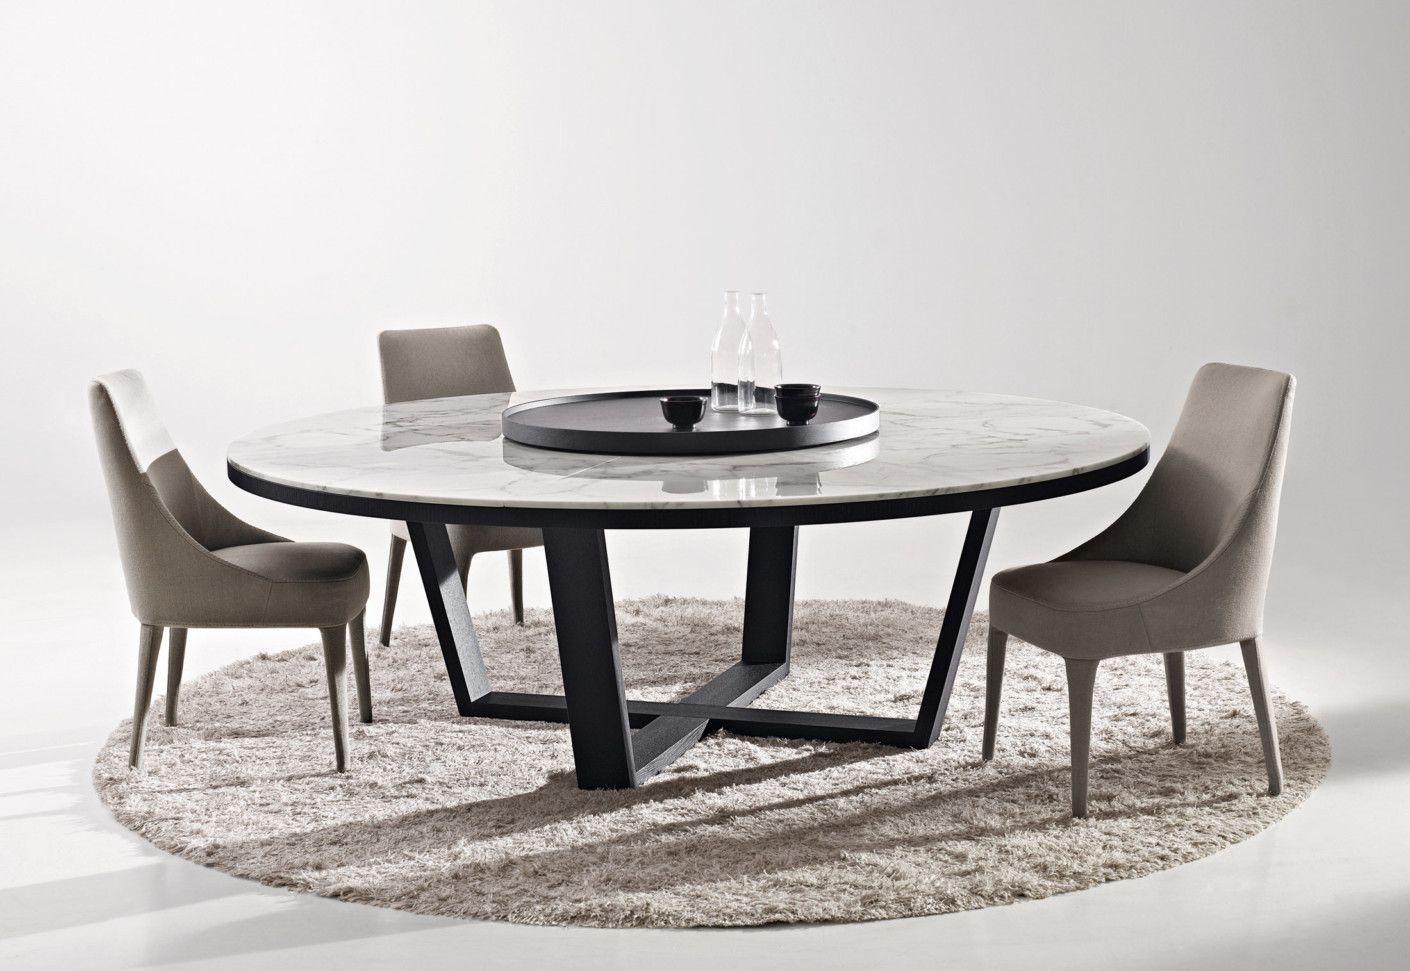 Dining / Kitchen tables: XILOS by Maxalto at STYLEPARK | Dining ...